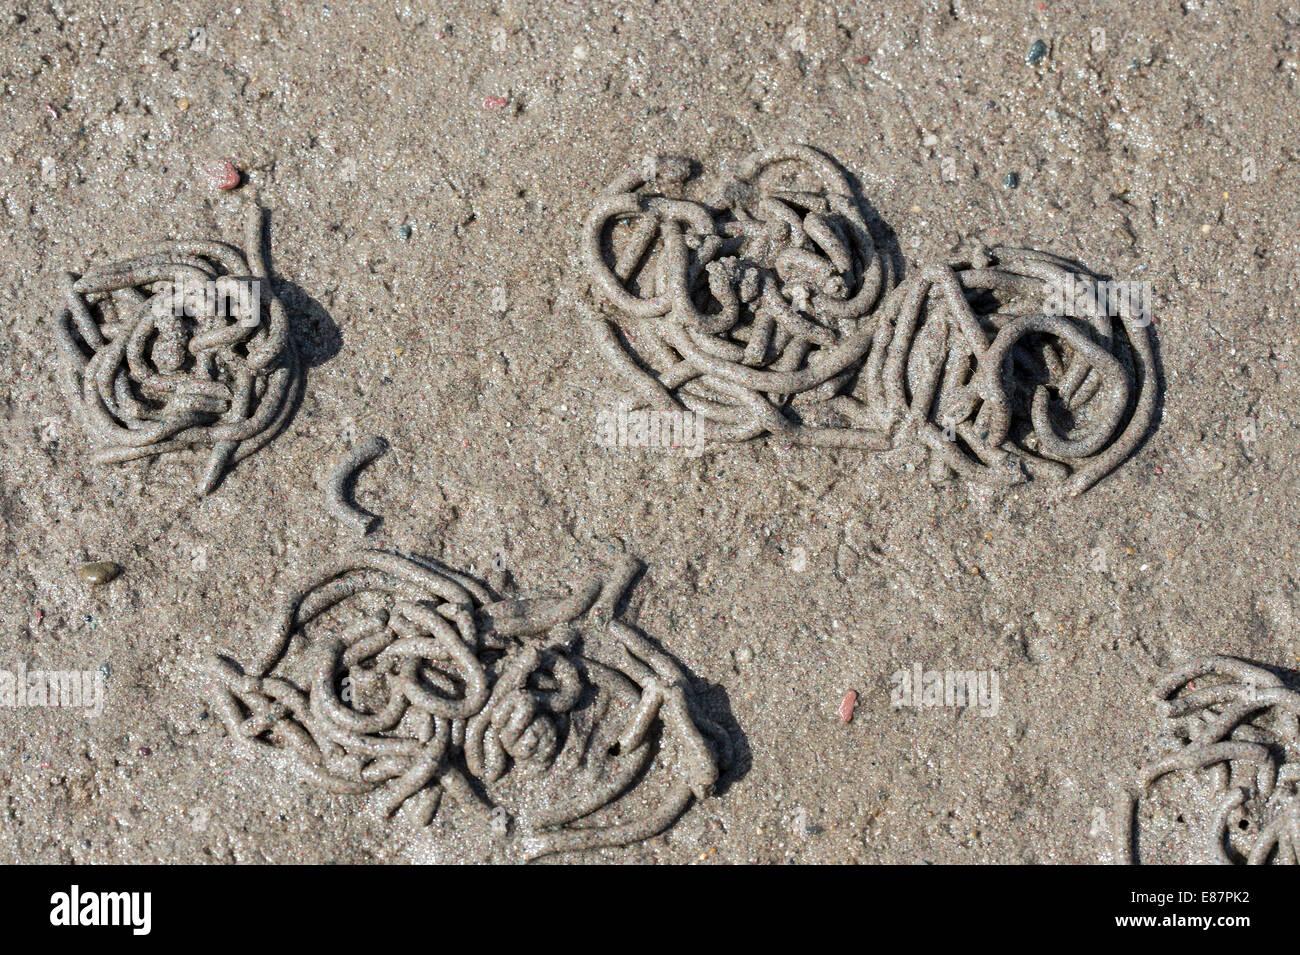 European Lugworm (Arenicola marina) cast of defaecated sediment on beach at low tide, coast the Gann Pembrokshire - Stock Image